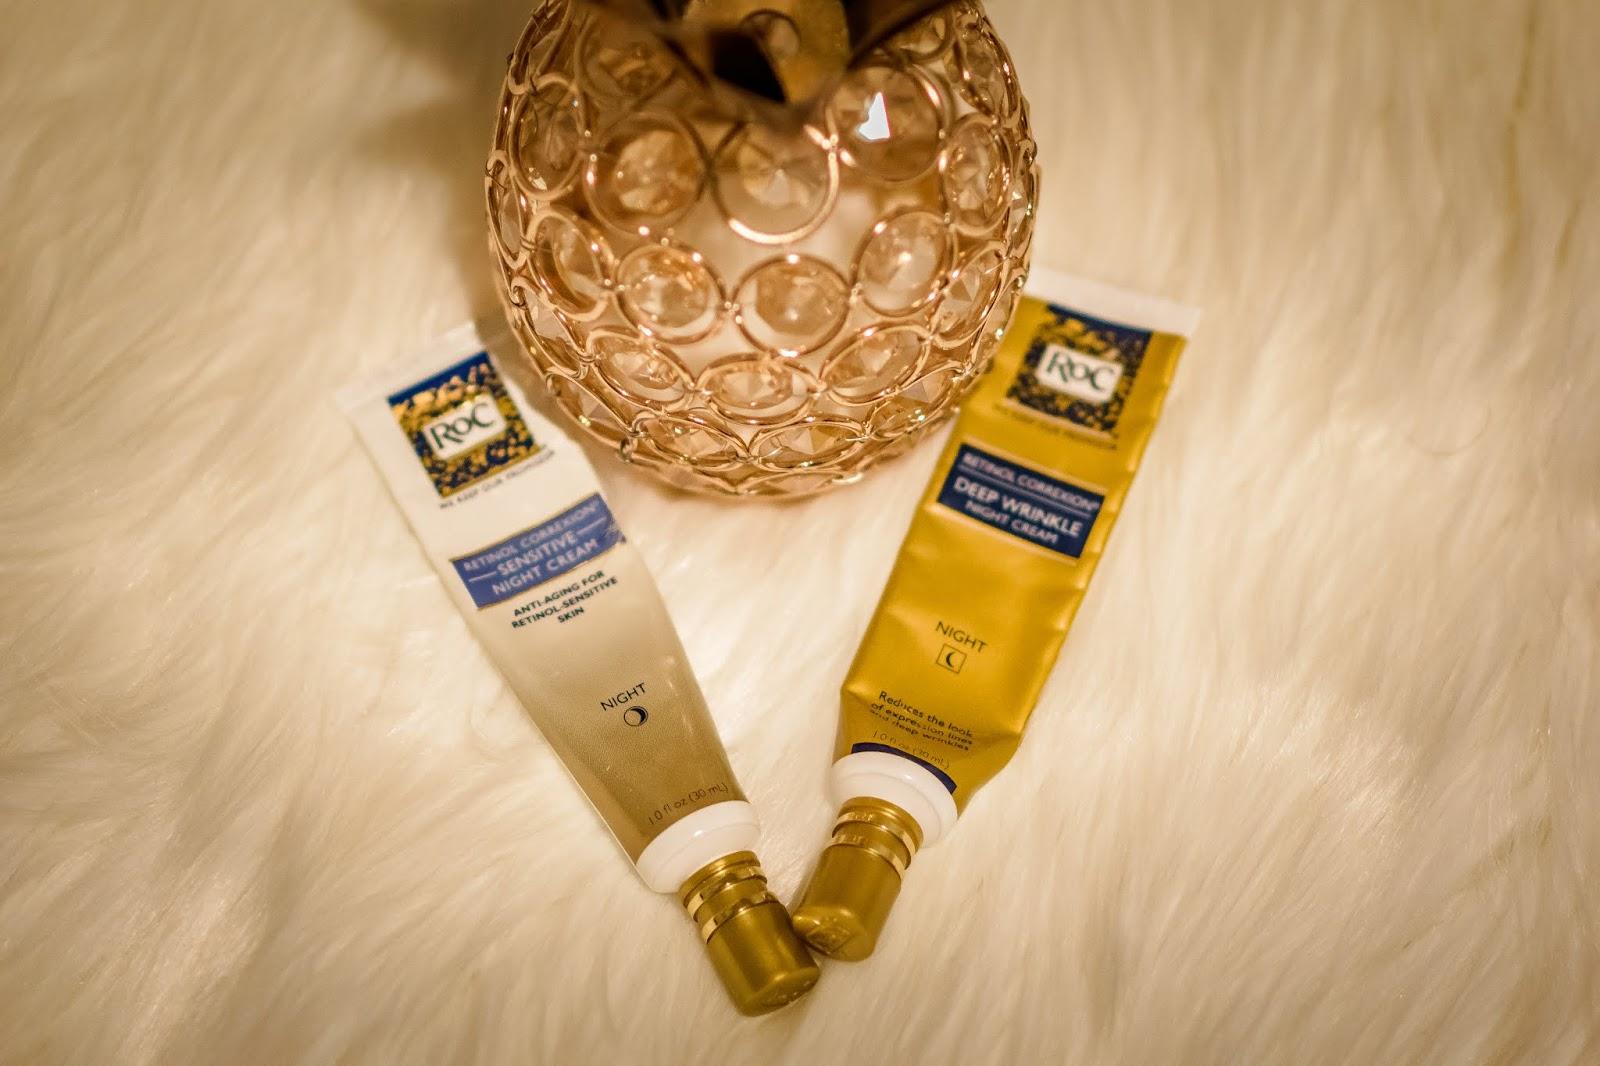 My Skin Care Secret Weapons - Journey towards clear skin; Aim for Glam; Prasanthi Kadiyala; Skin Care; Tatcha Deep Cleanse; Drunk Elephant Vitamin C SErum; TruSkin Vitamin C Serum; Sunday Riley Tidal; RoC Retinol; Olay 7-in-1 moisturizer;